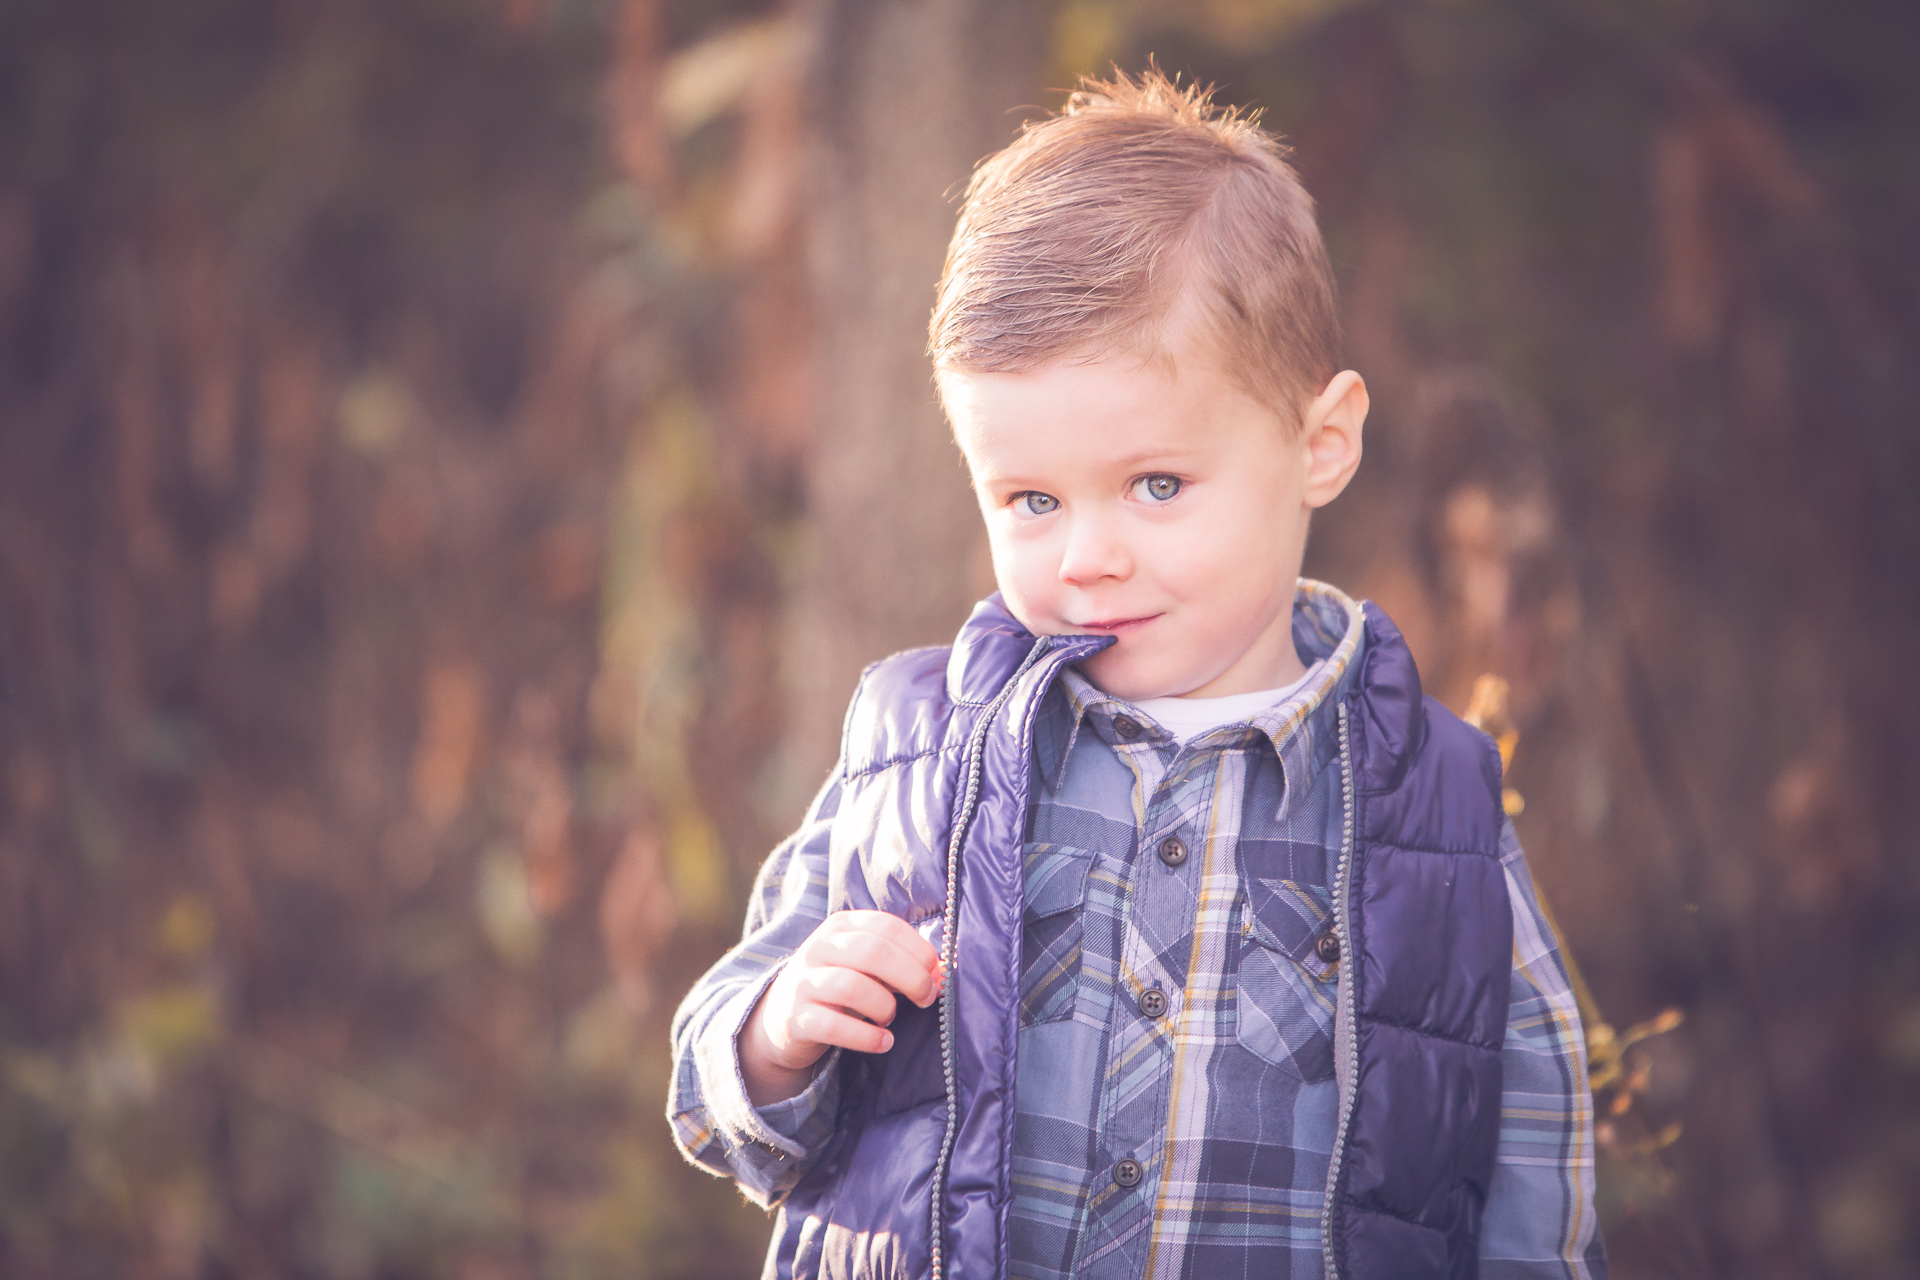 urbandale-children-photography-2.jpg